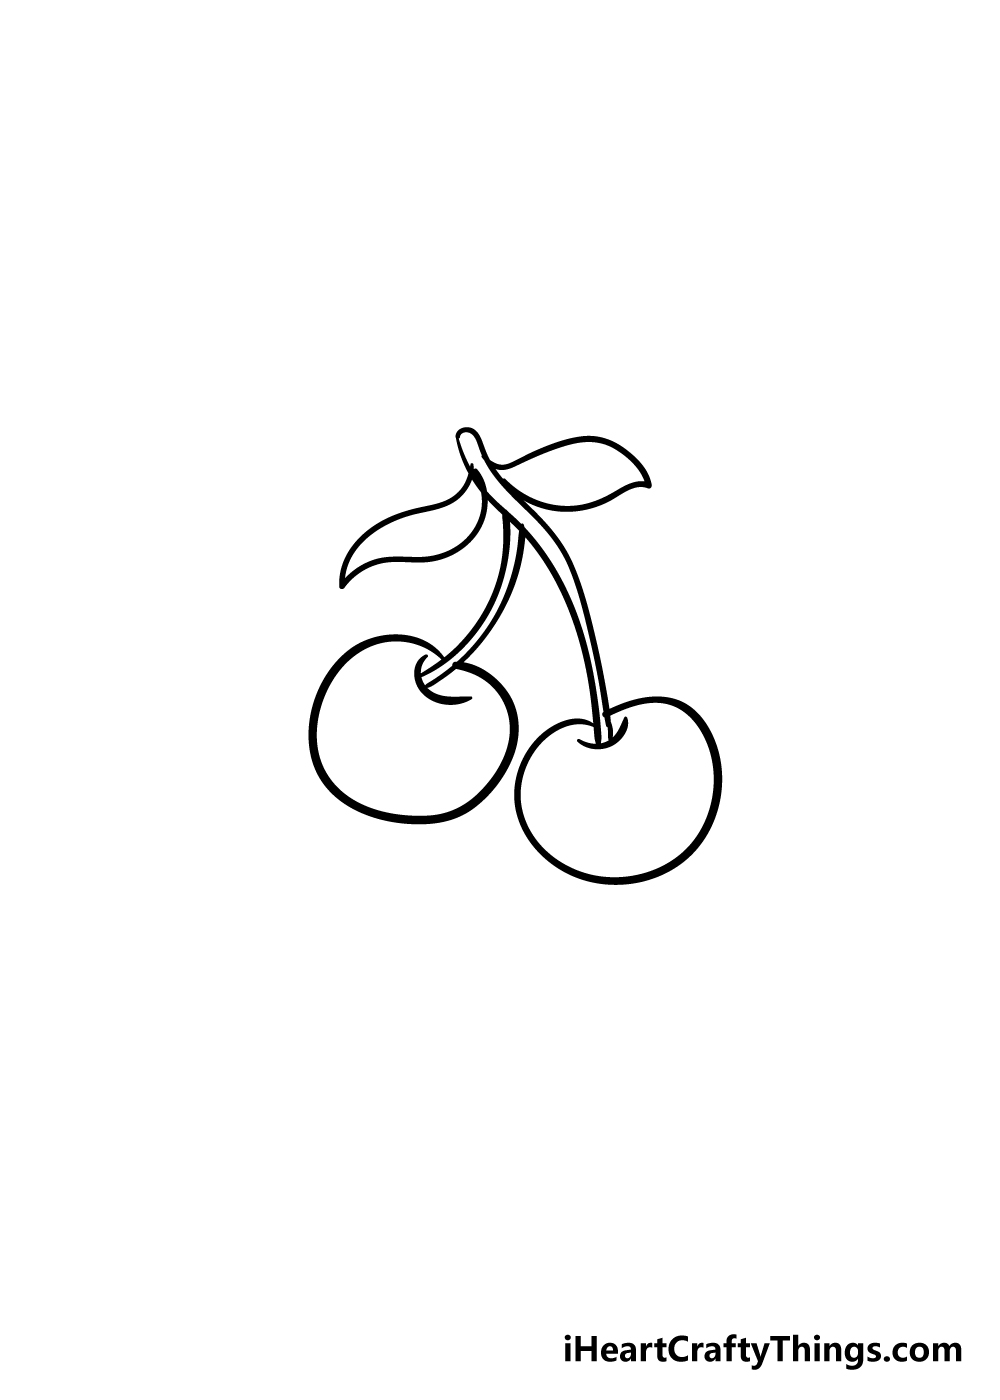 cherry drawing step 4